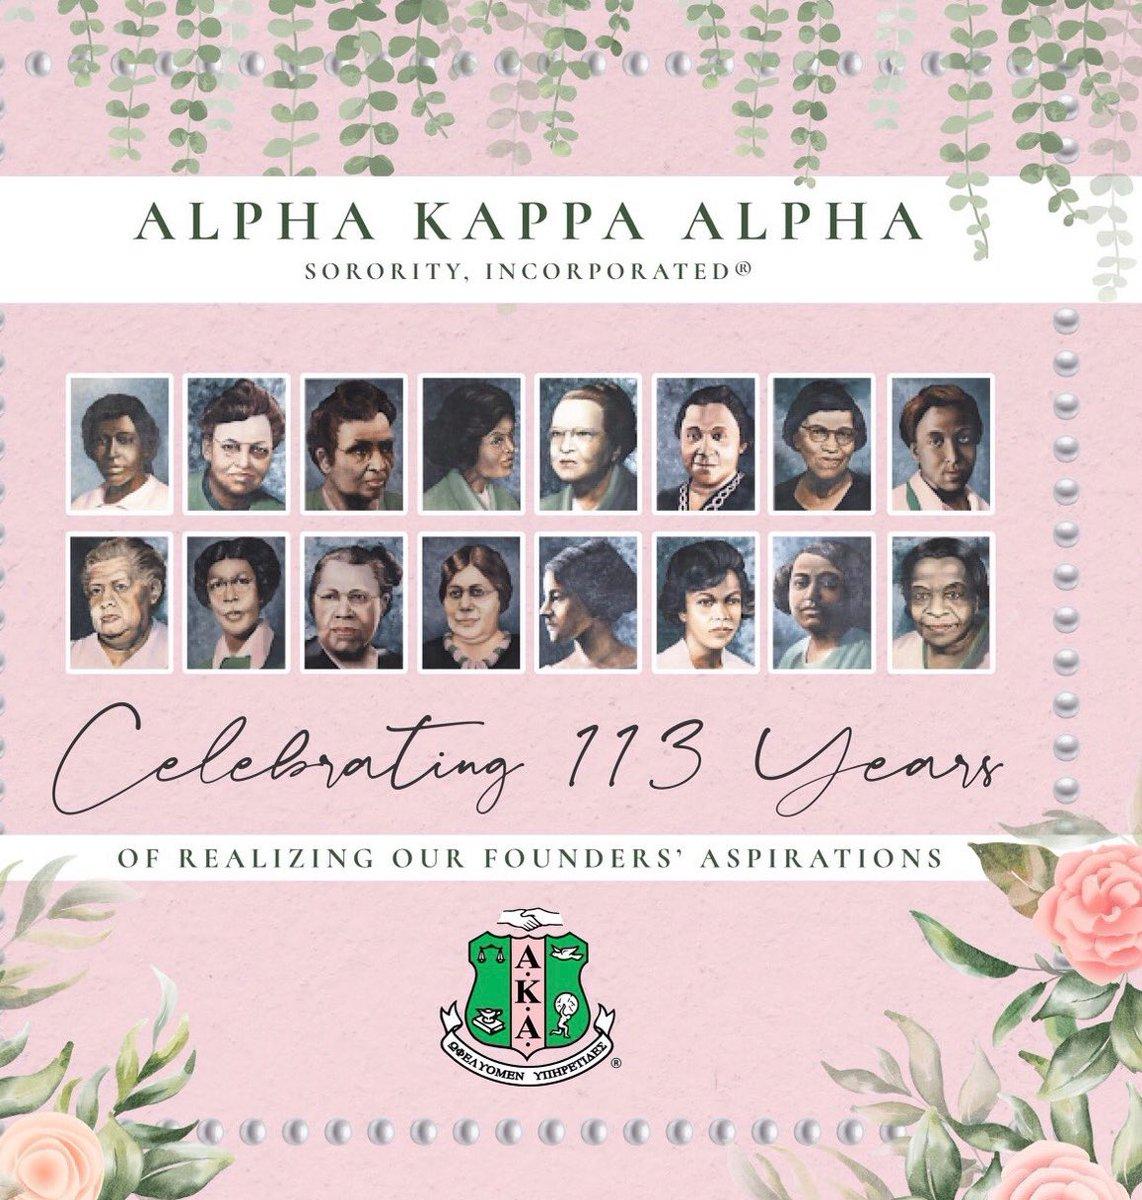 HAPPY FOUNDERS' DAY to the women of Alpha Kappa Alpha Sorority, Inc. #AKA1908 #SkeeWee